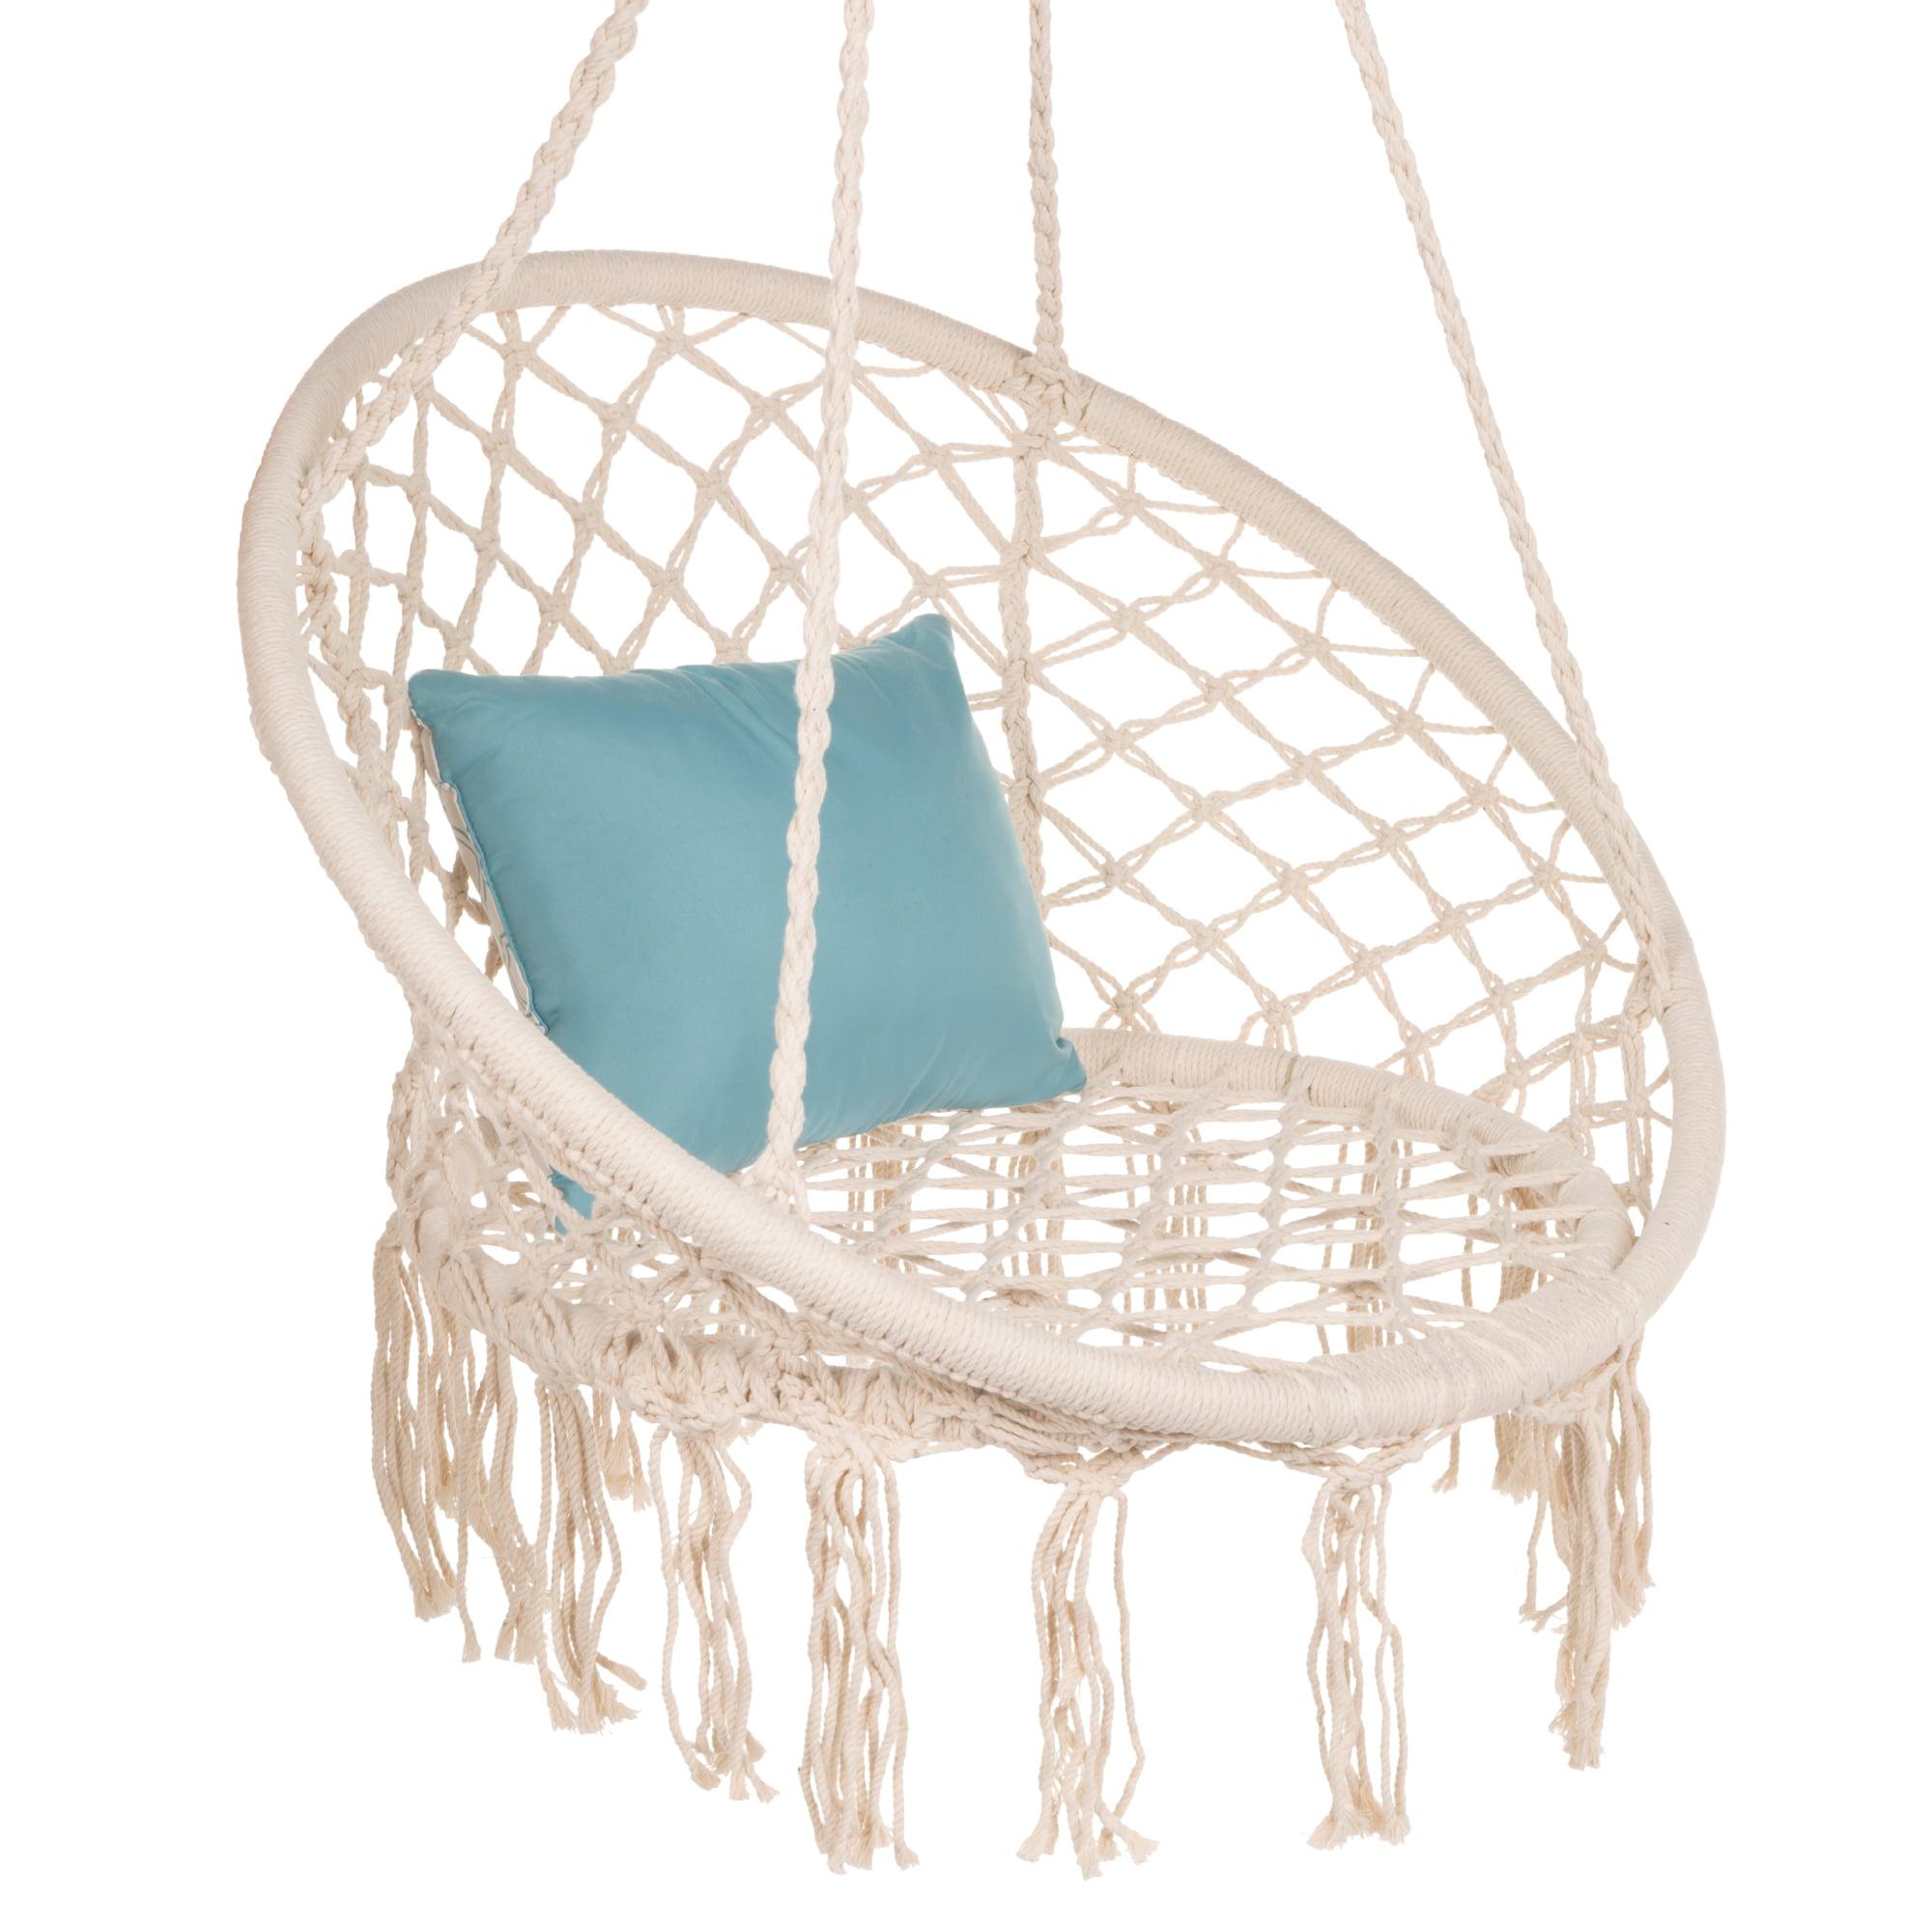 Best Choice Products Handwoven Cotton Macrame Hammock Hanging Chair Swing For Indoor Outdoor Use W Backrest Beige Walmart Com Walmart Com